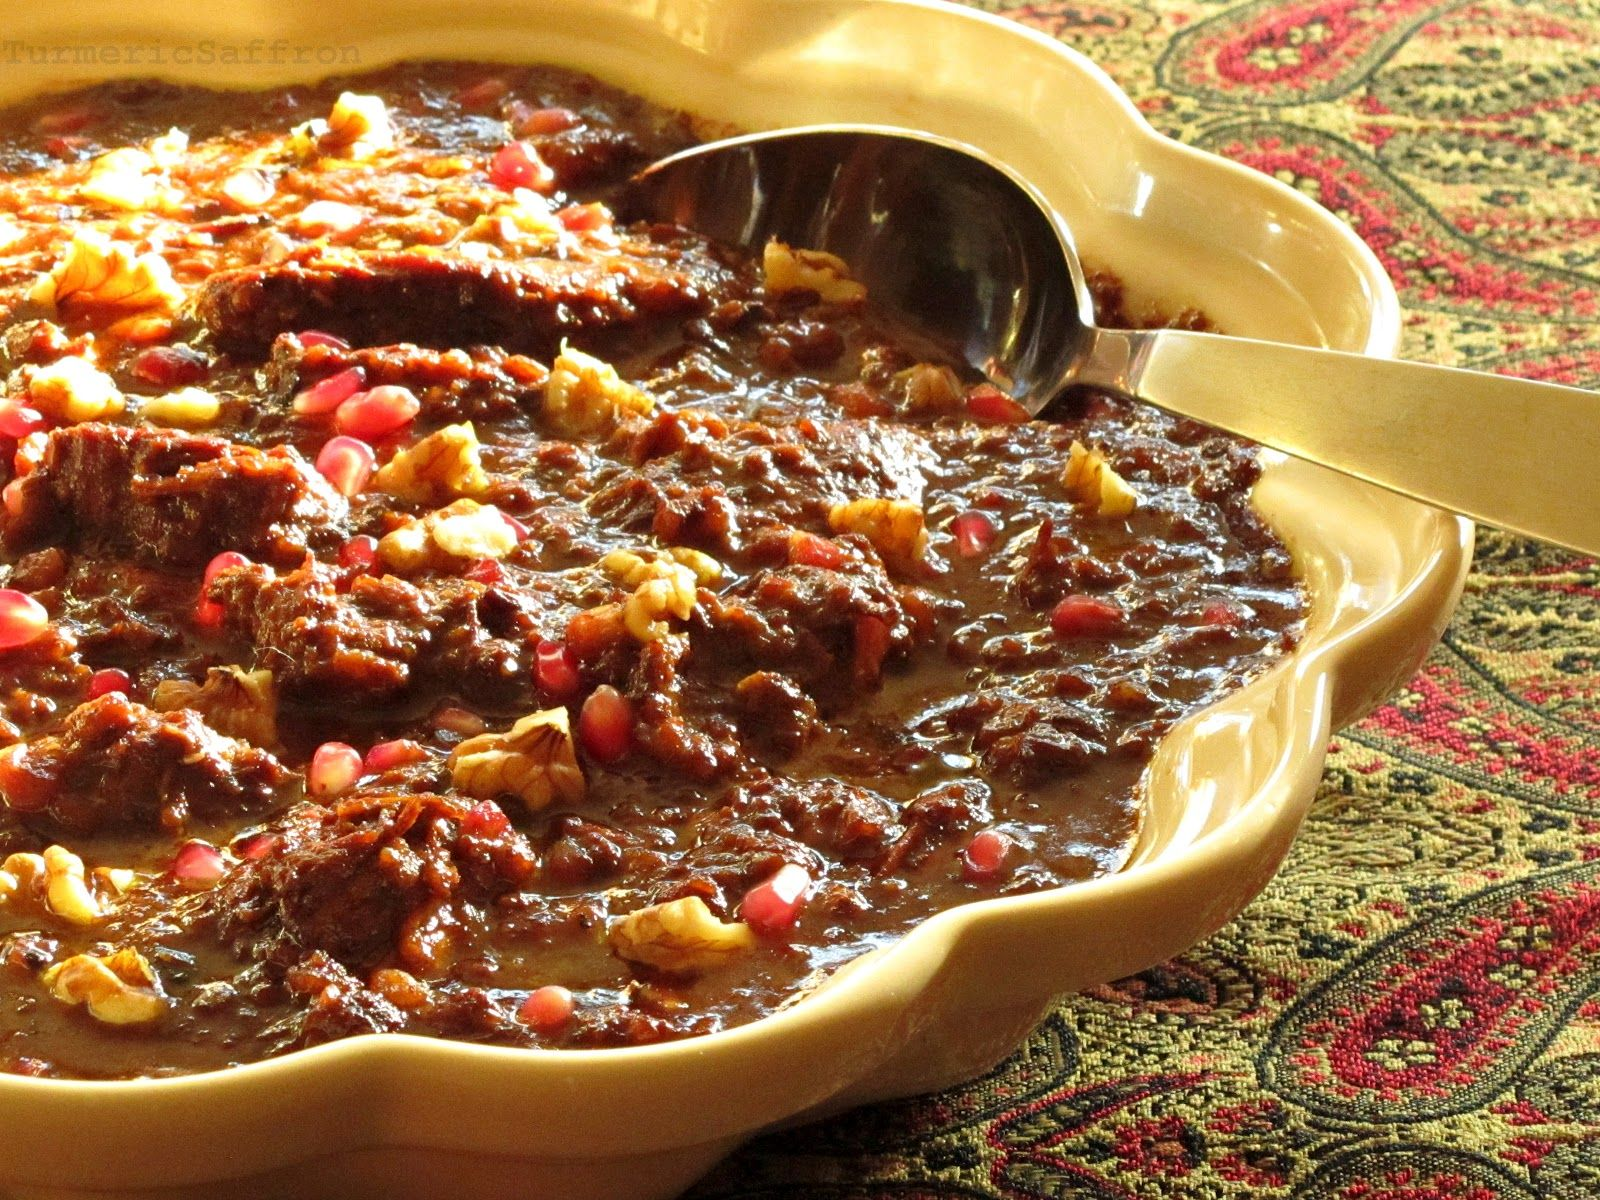 Turmeric and Saffron: Fesenjoon - Pomegranate Walnut ... Persian Pomegranate And Walnut Chicken Stew